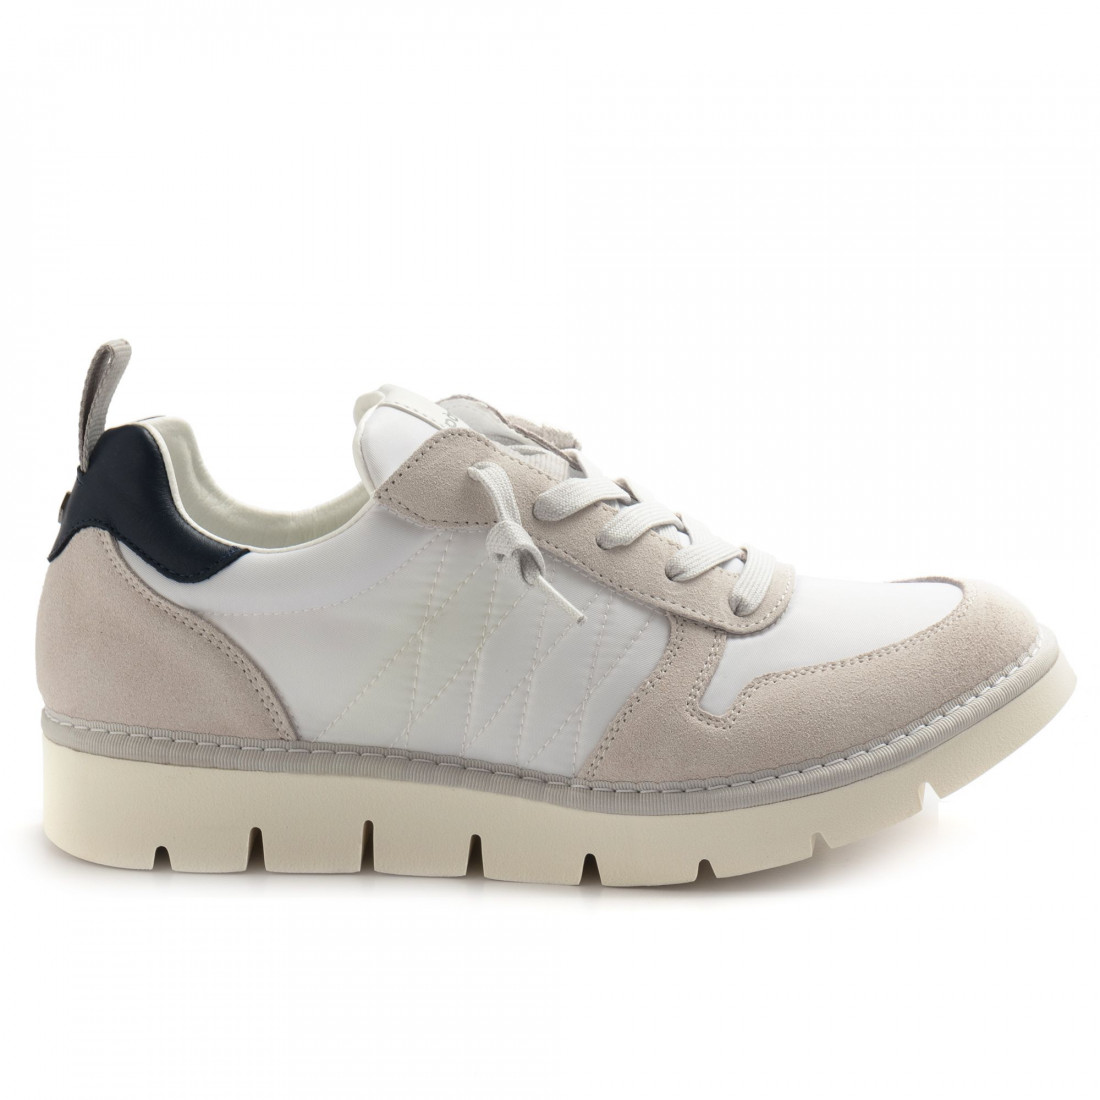 sneakers man panchic p05m18021ts2c00071 8502